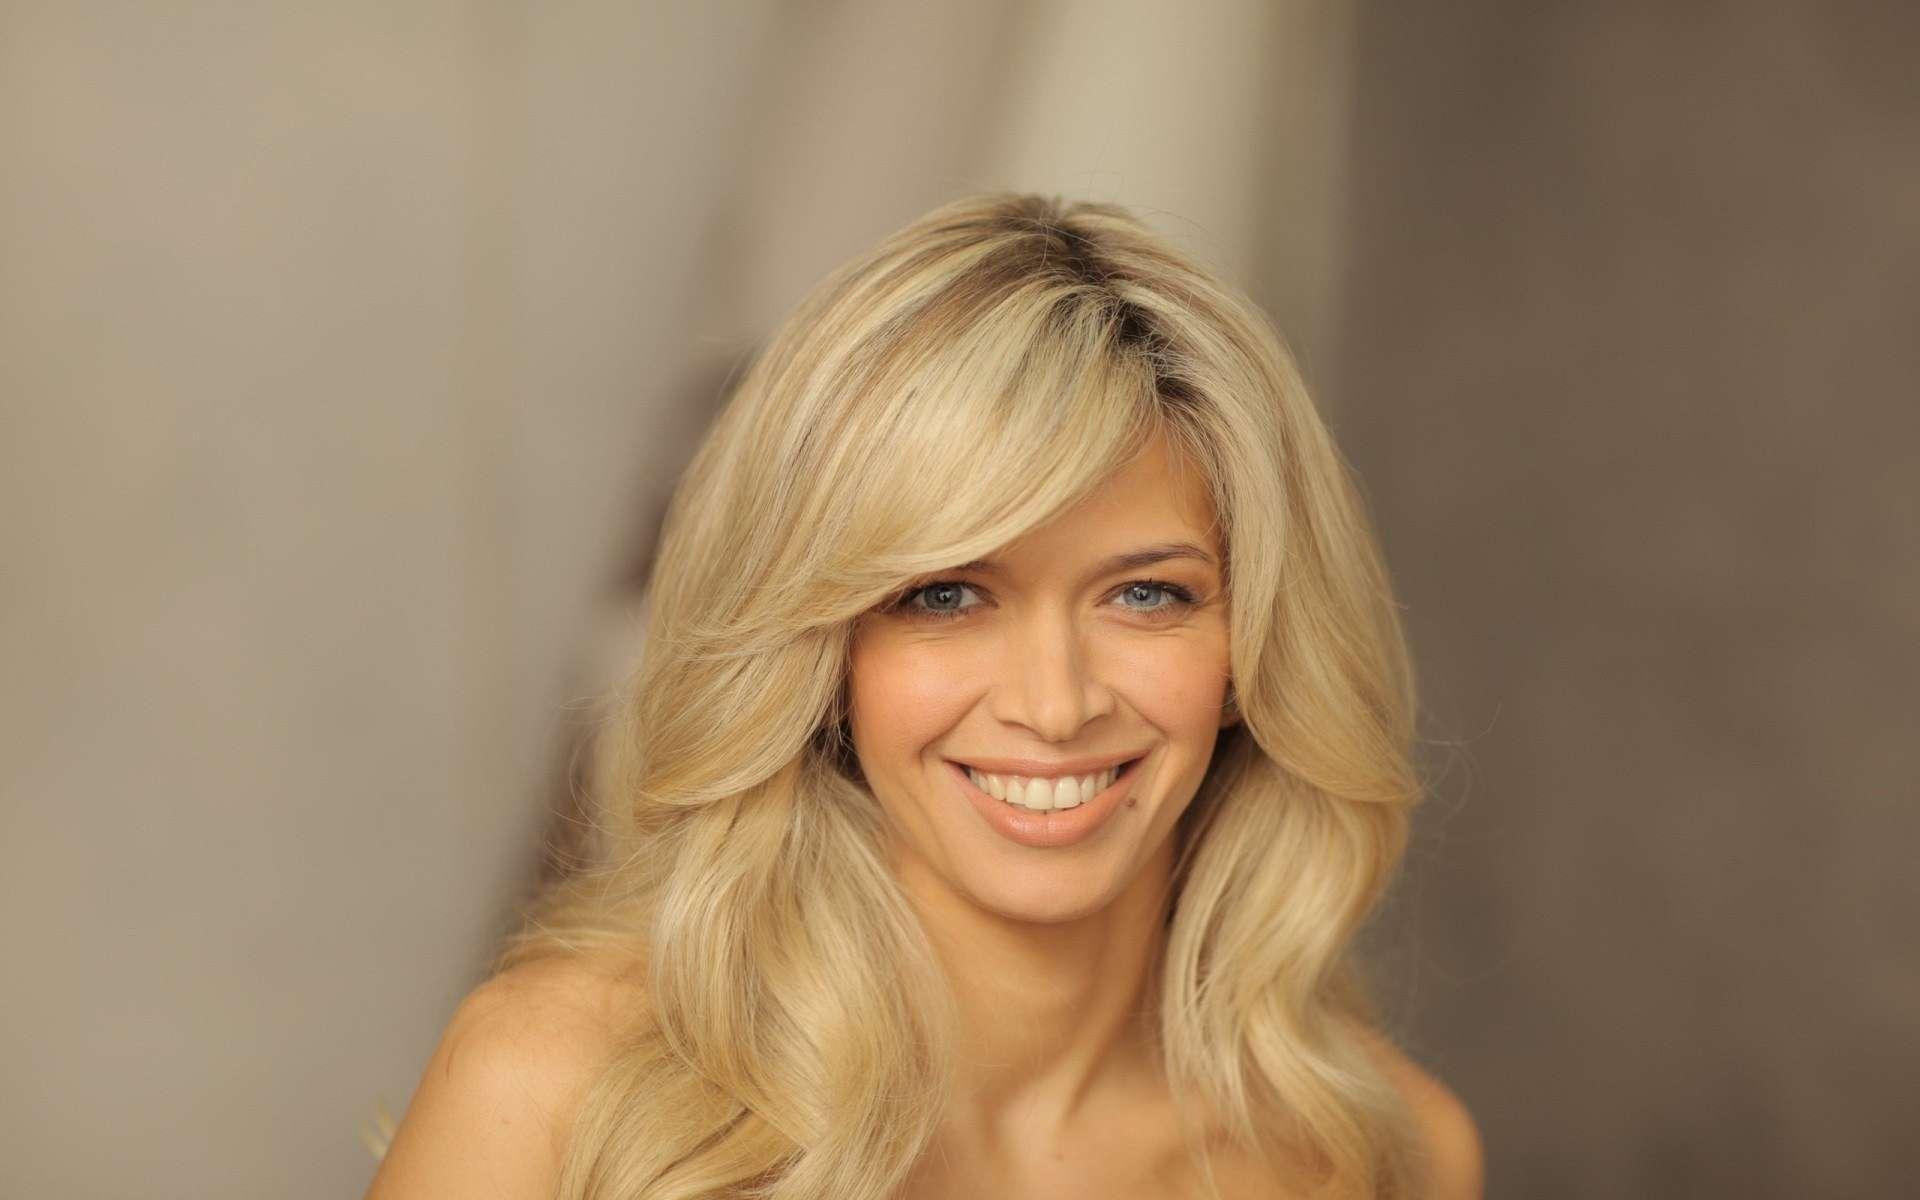 Известные девушки блондинки фото